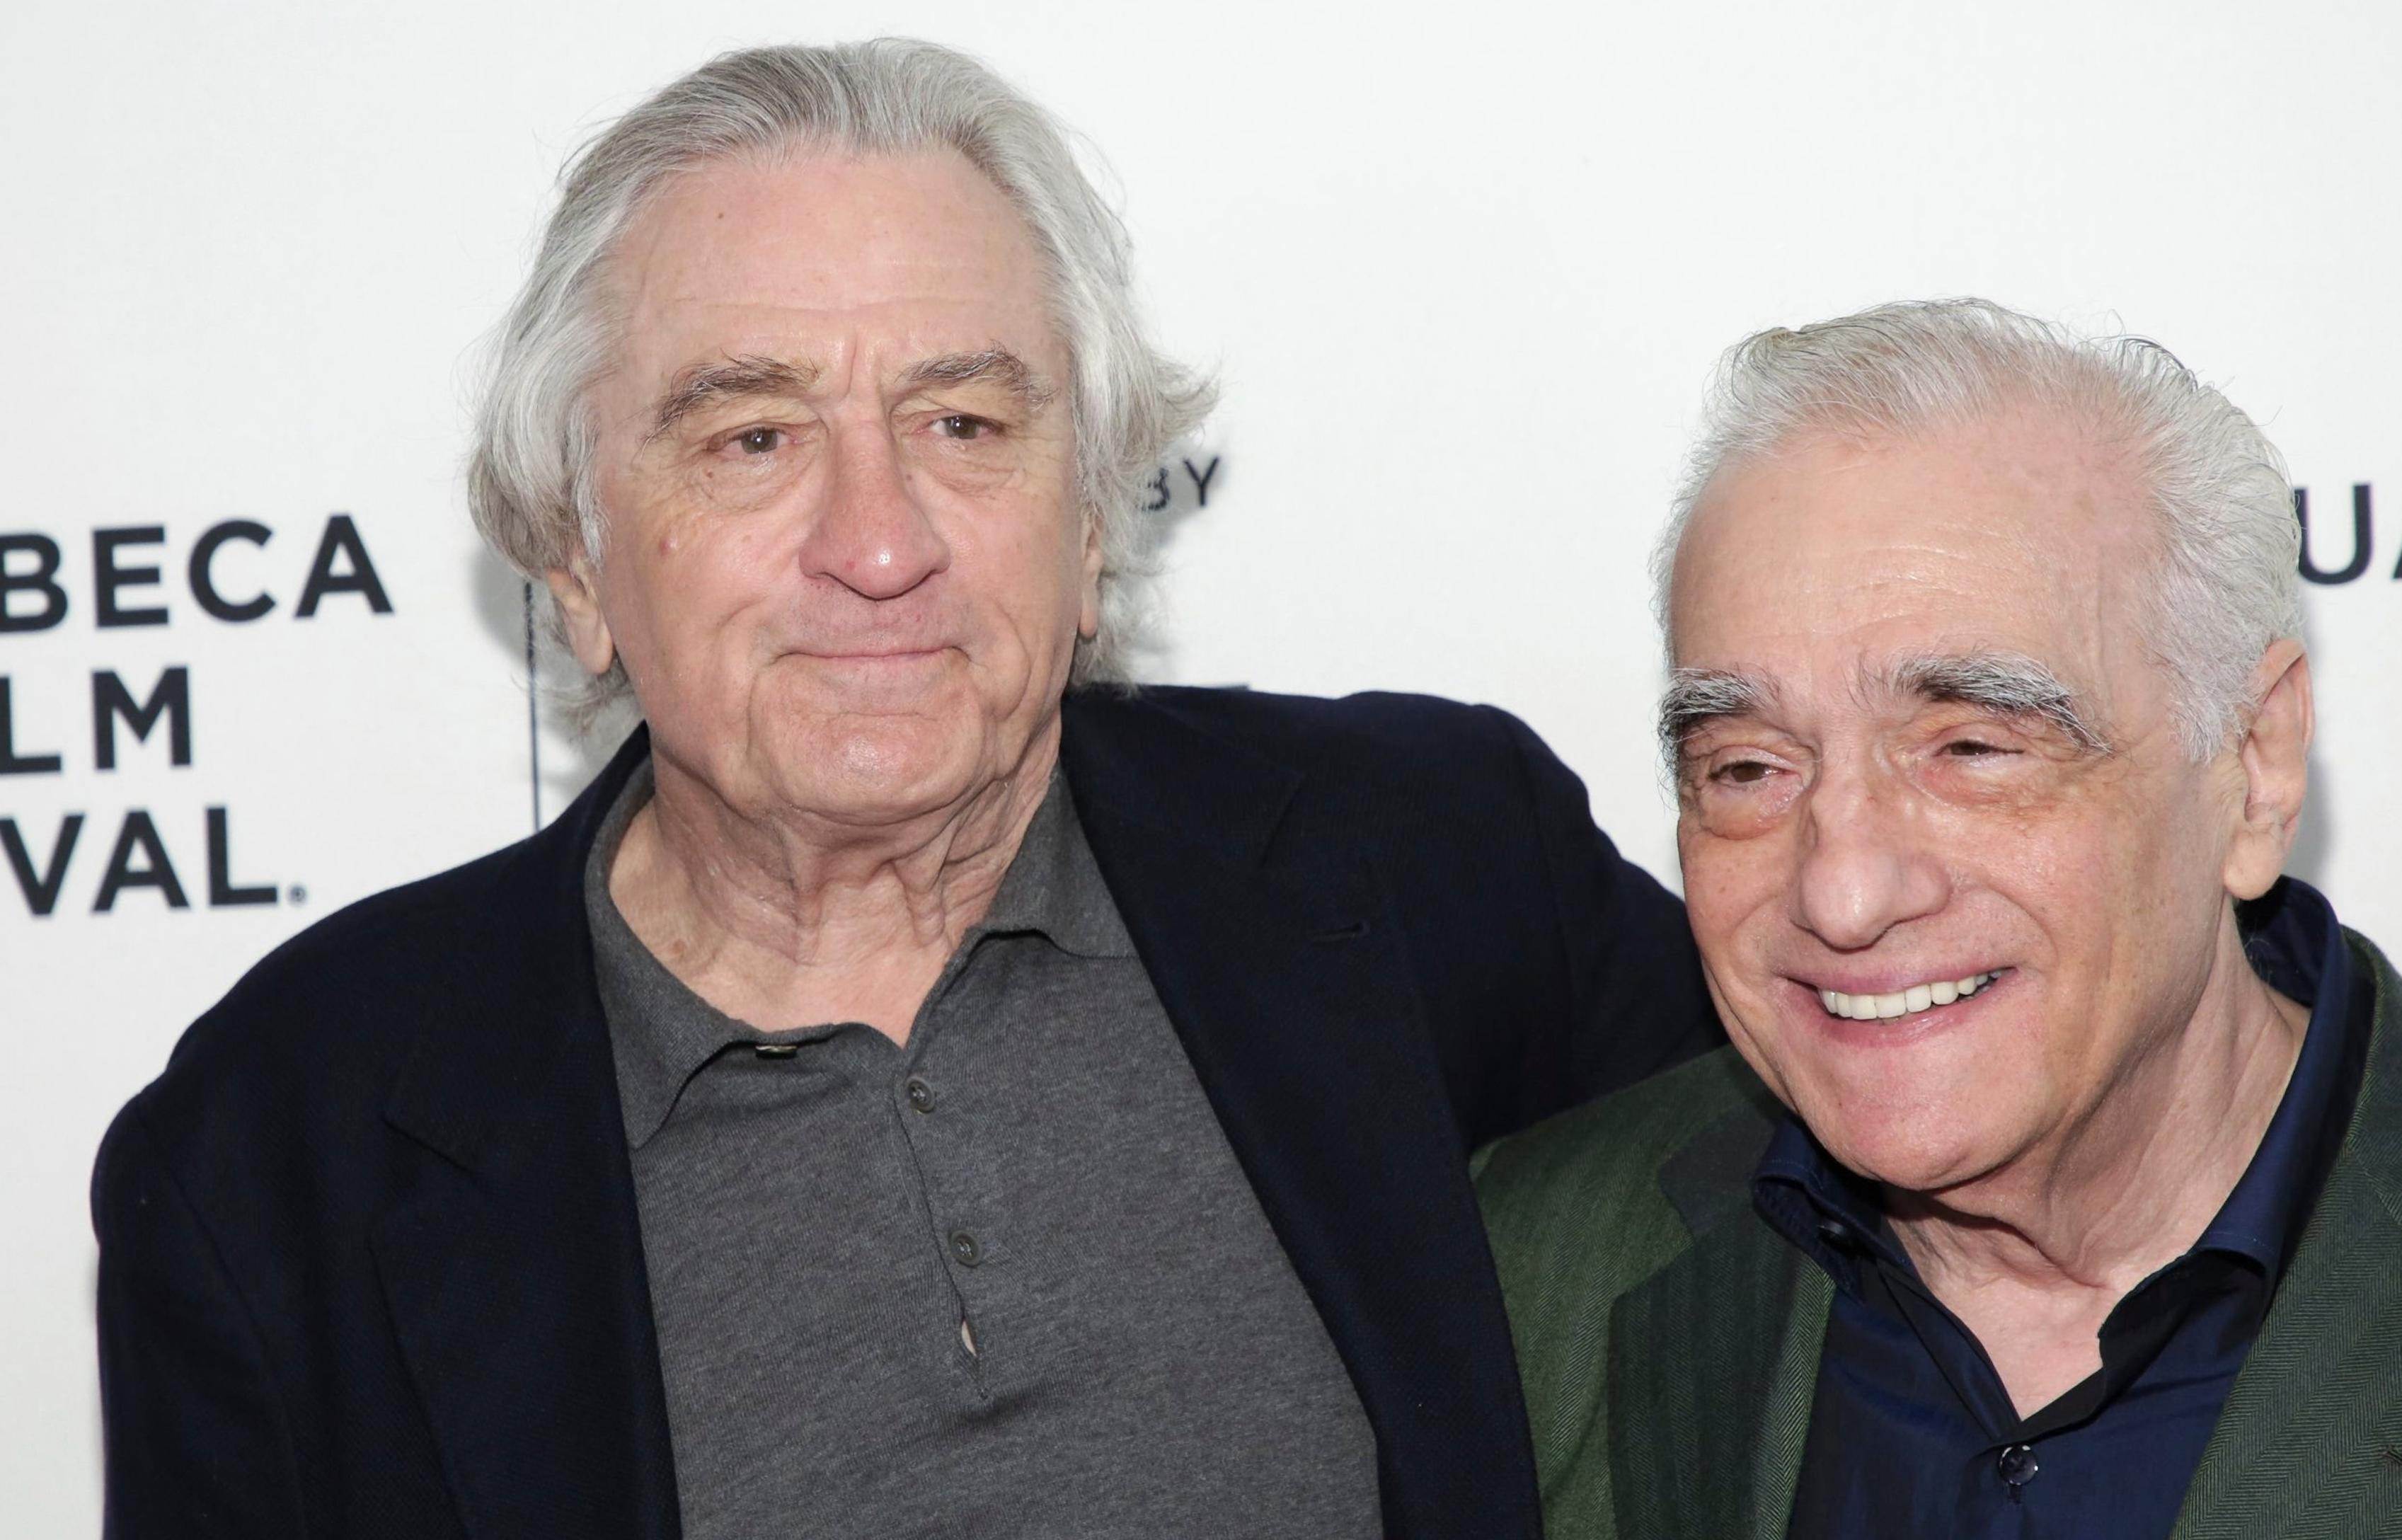 Martin Scorsese 'Concerned' by 'The Irishman' De-Aging Visual